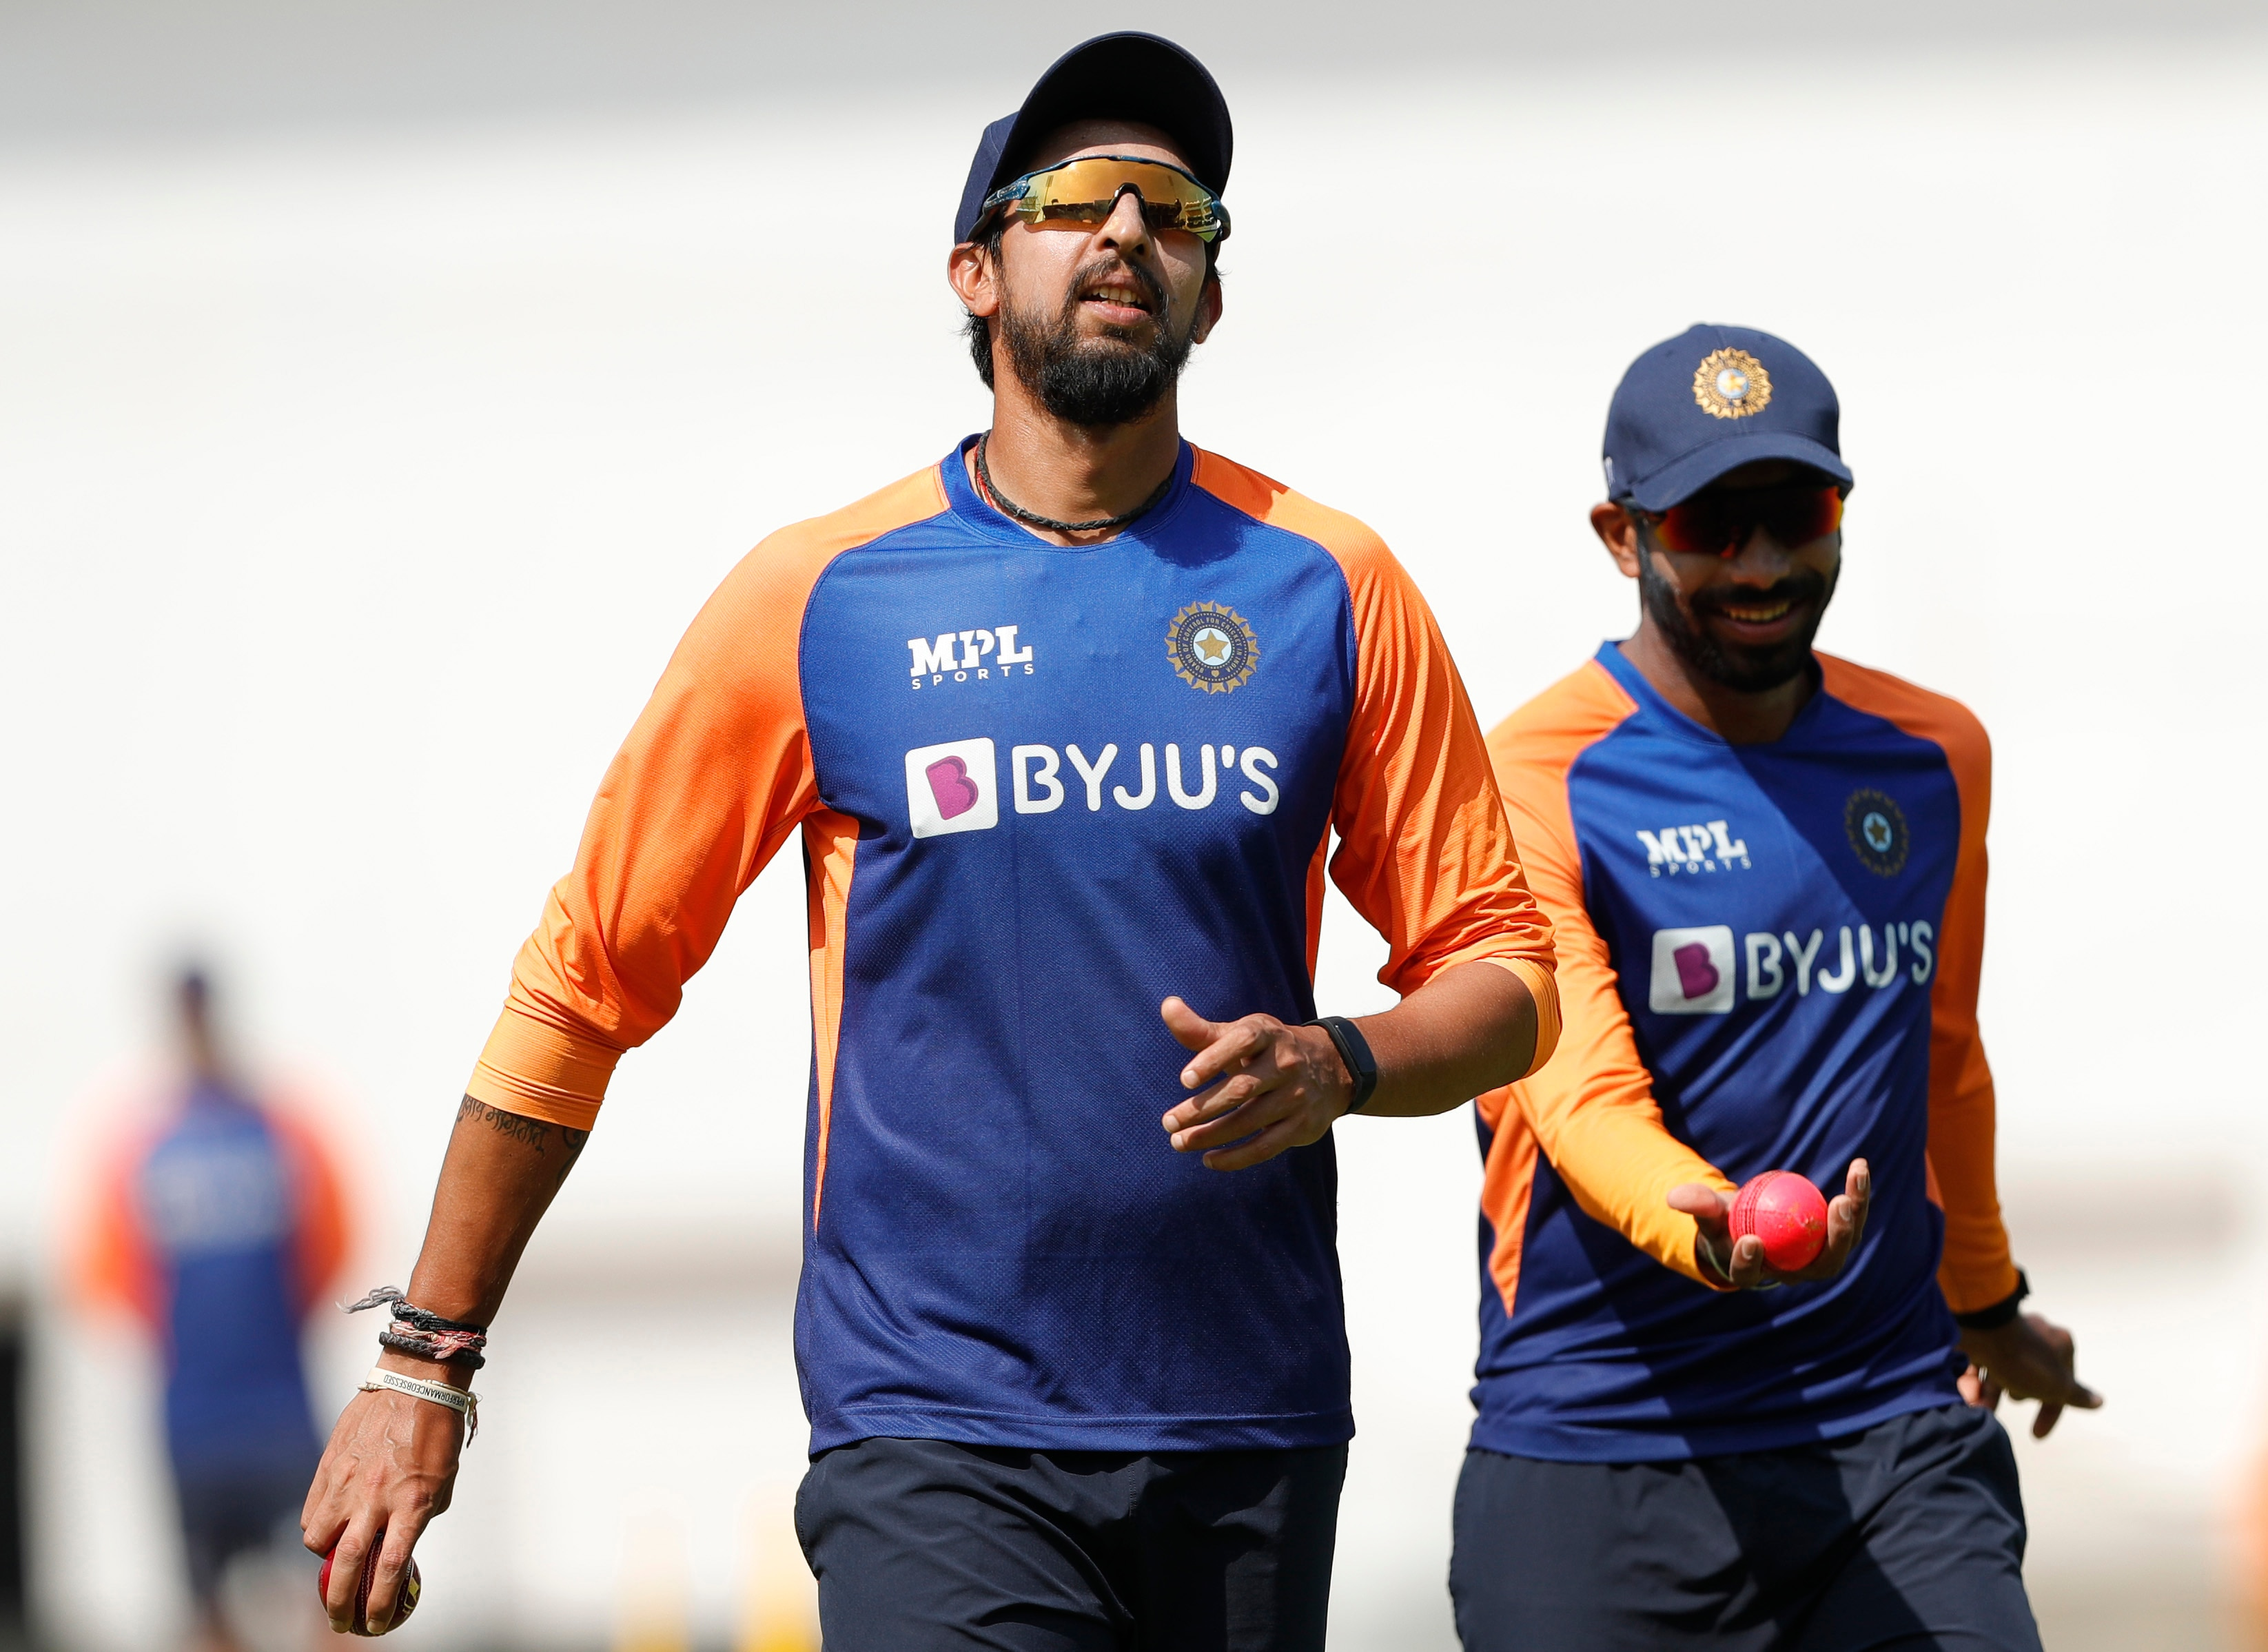 India vs England: বিশ্ব টেস্ট চ্যাম্পিয়নশিপই আমার কাছে বিশ্বকাপ, জানালেন Ishant Sharma